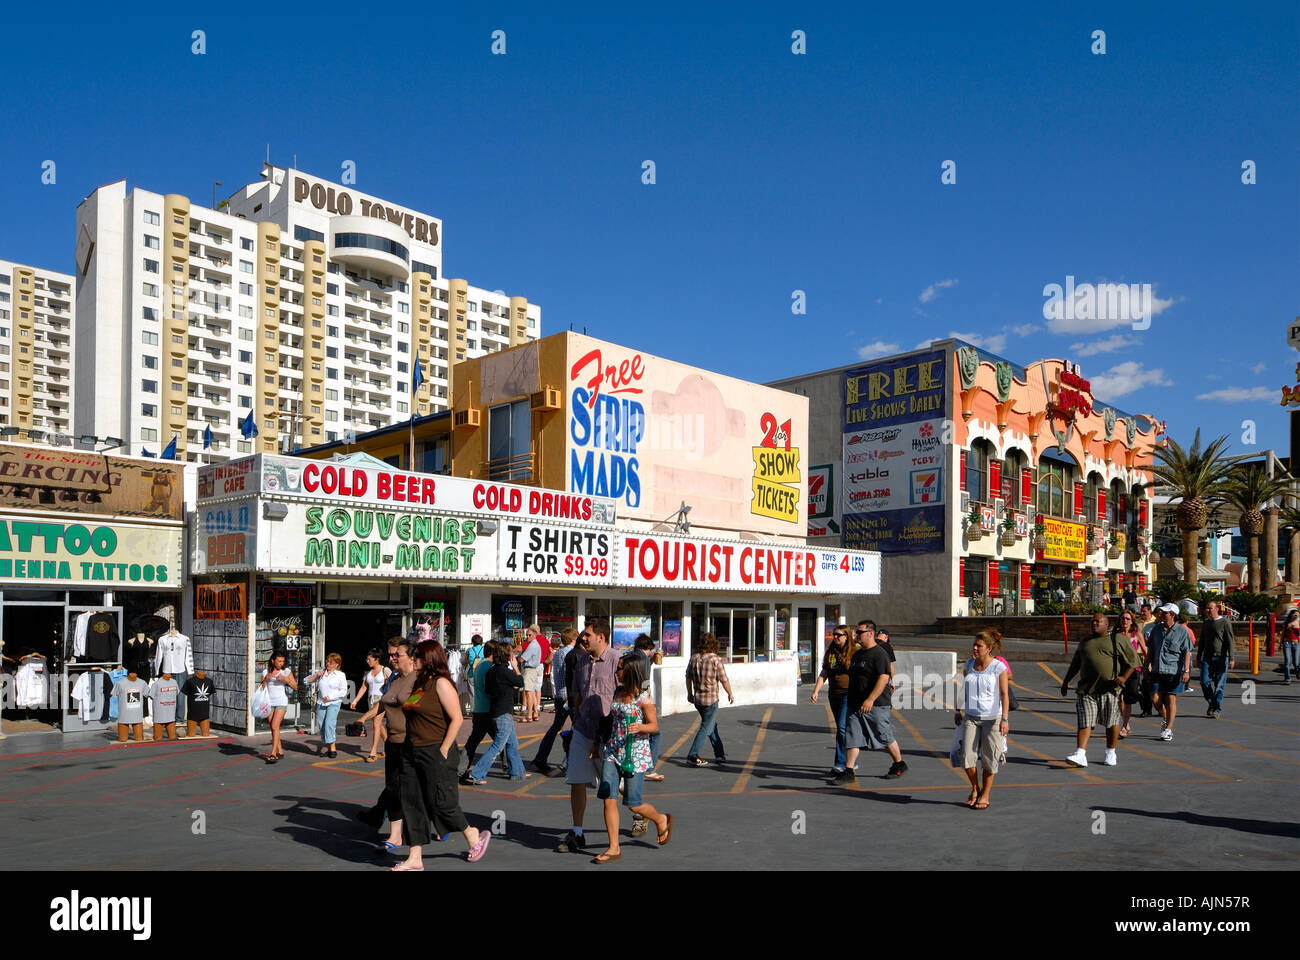 China Star Buffet Mini Mart Internet Cafe Las Vegas Strip Nevada